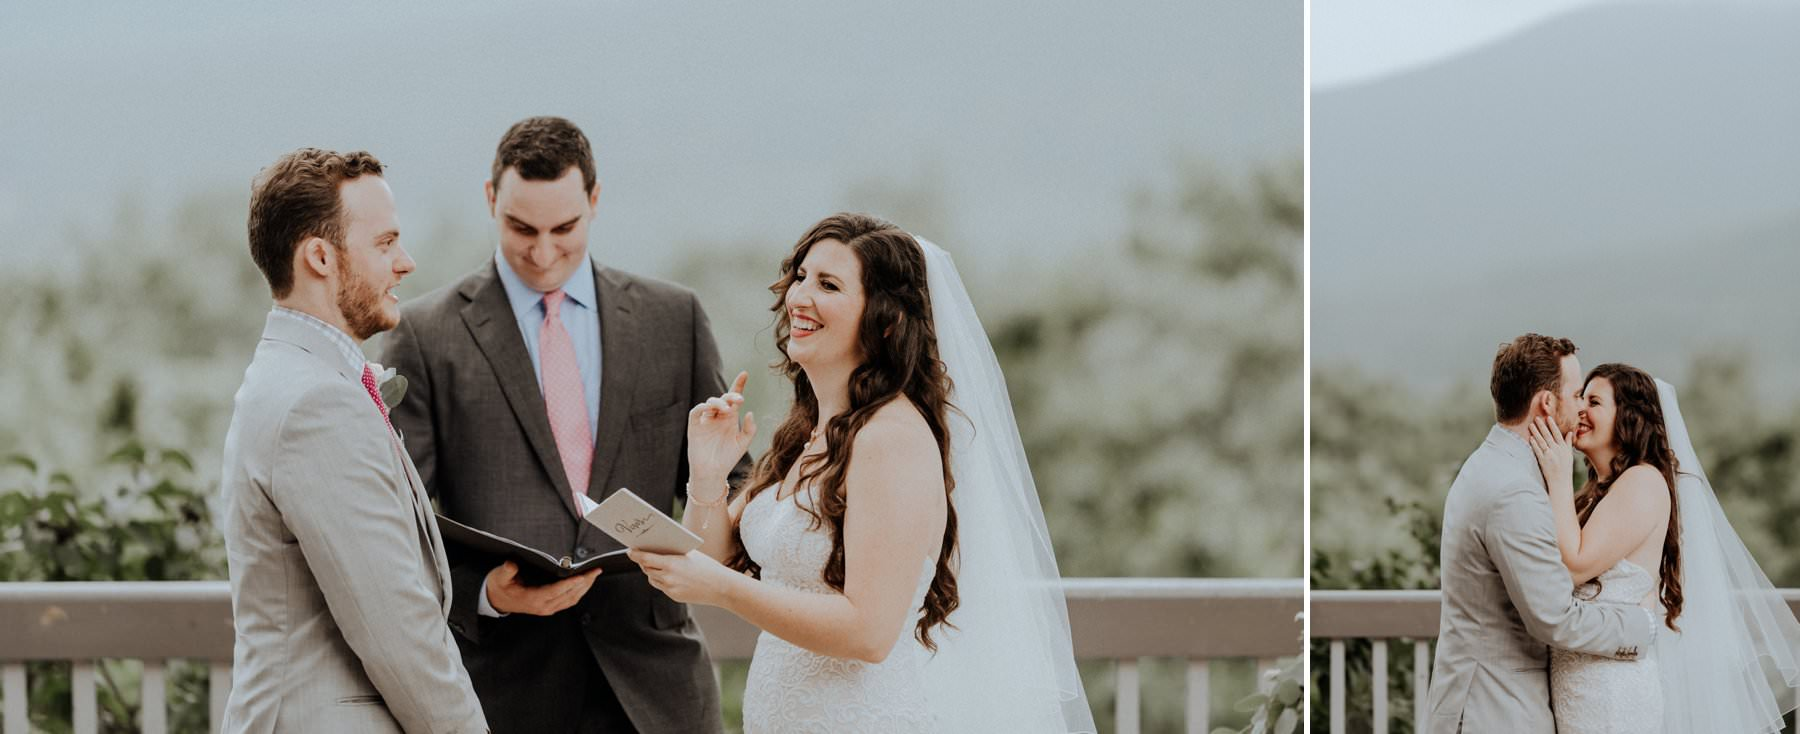 Onteora-Mountain-House-wedding-photographer-99.jpg